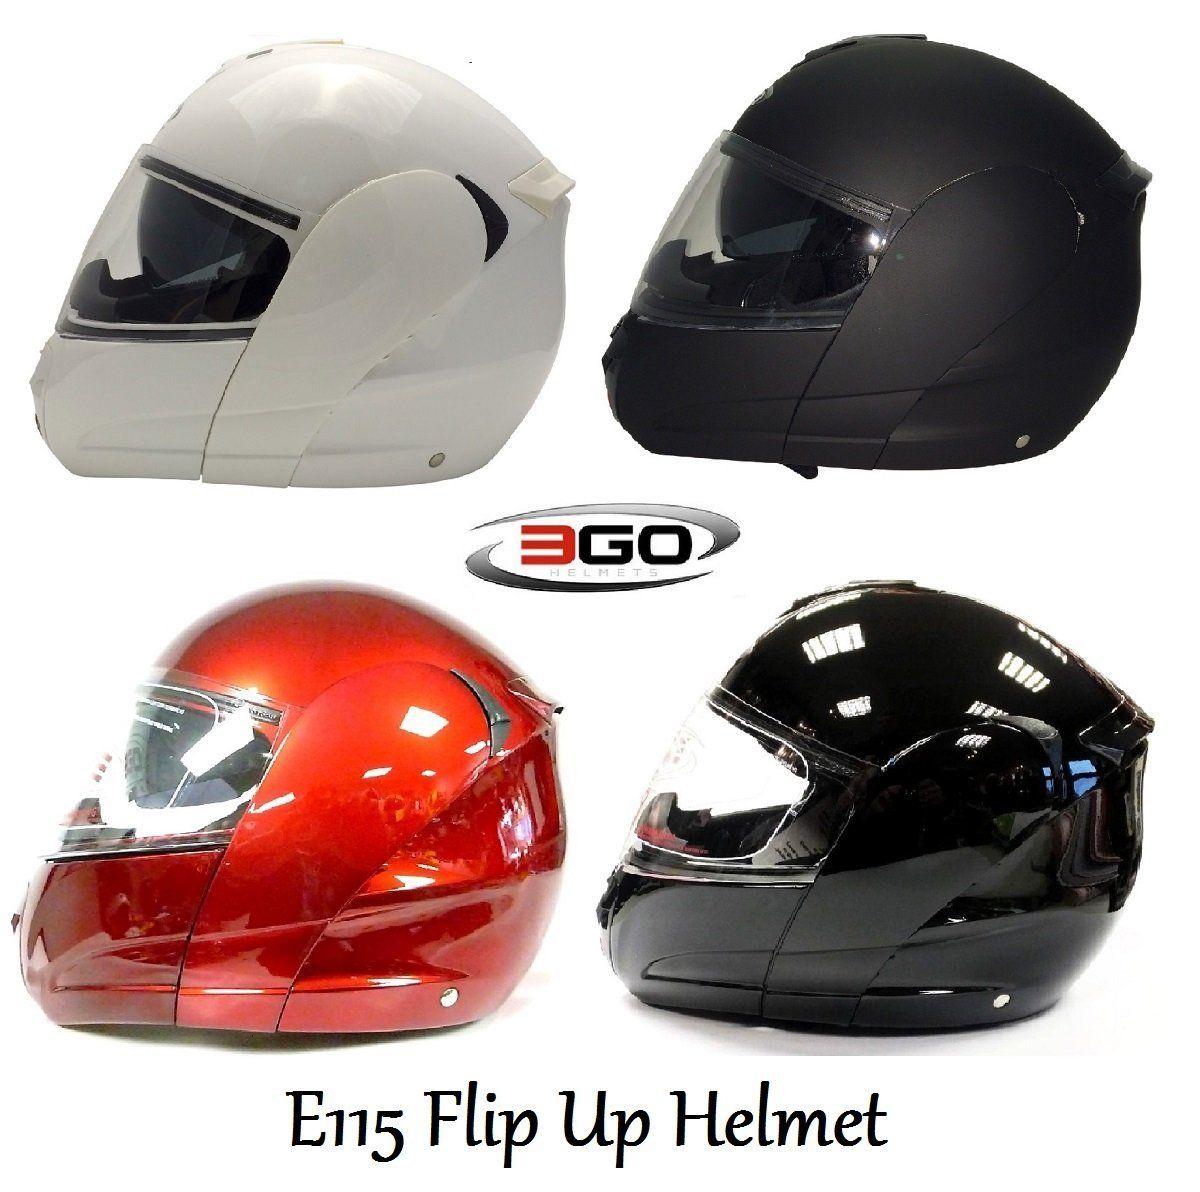 MOTORBIKE 3GO E115 FLIP UP FRONT DVS HELMET New Motorbike Scooter